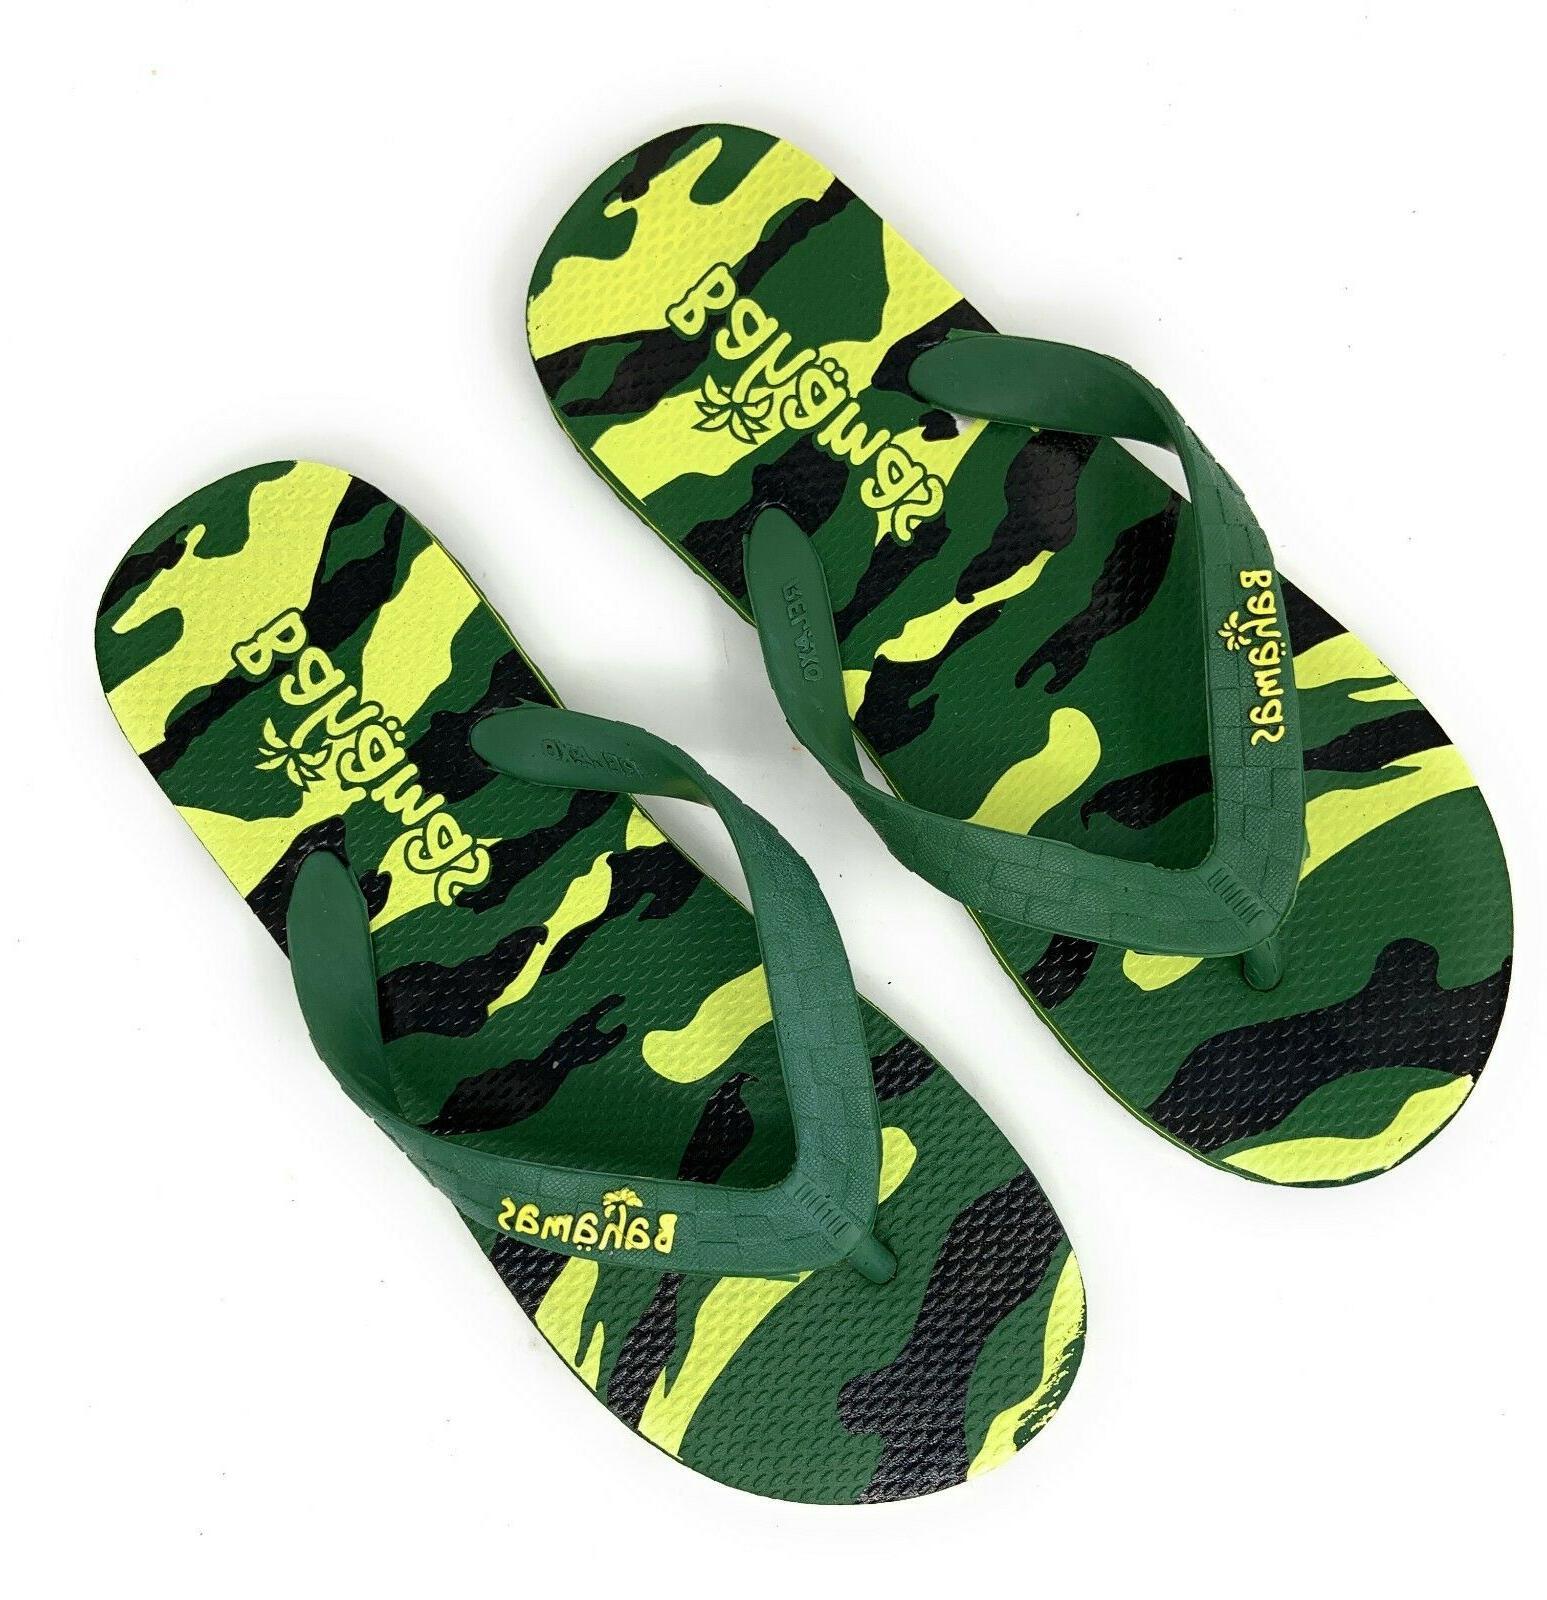 Bahamas Flip Flops Premium Comfort Sandals Beach